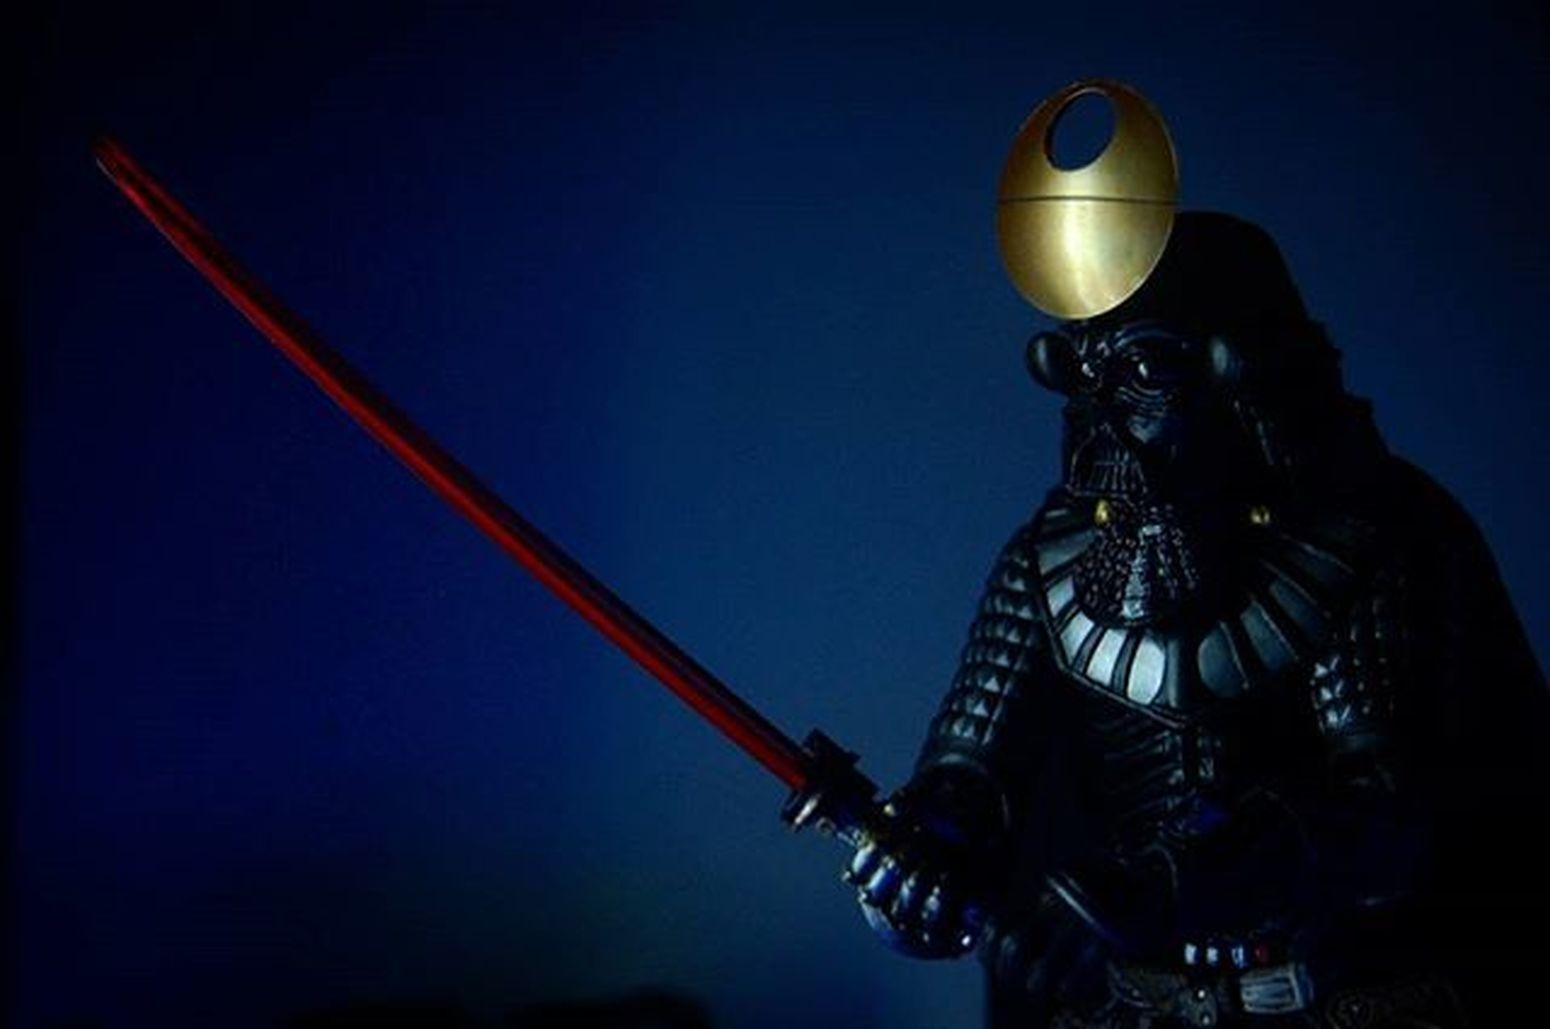 Lorudo Veidaaa! Darthvader Samuraitaisho Movierealization Deathstararmor Deathstararmordarthvader